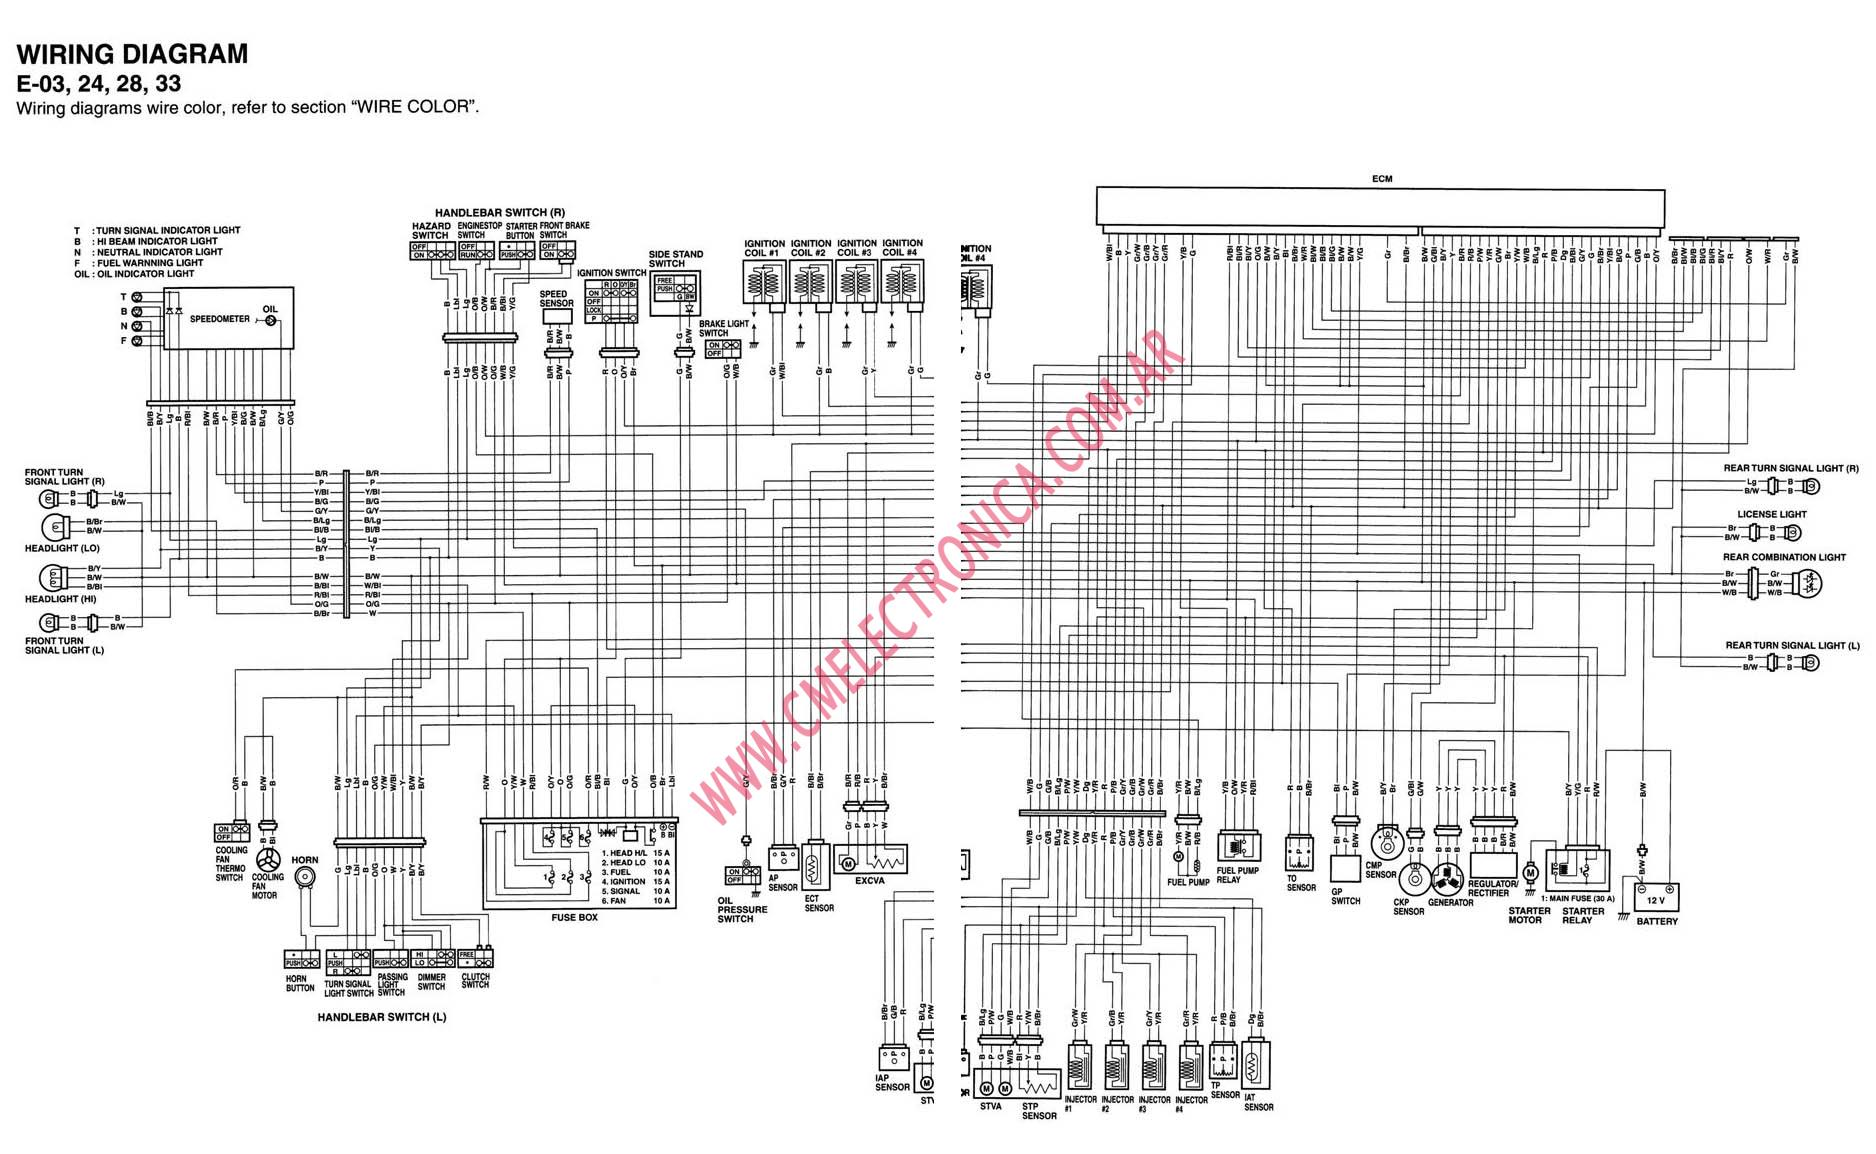 2001 Suzuki Gsxr Wiring Diagram - 2014 Ford Escape Fuse Box for Wiring  Diagram SchematicsWiring Diagram Schematics